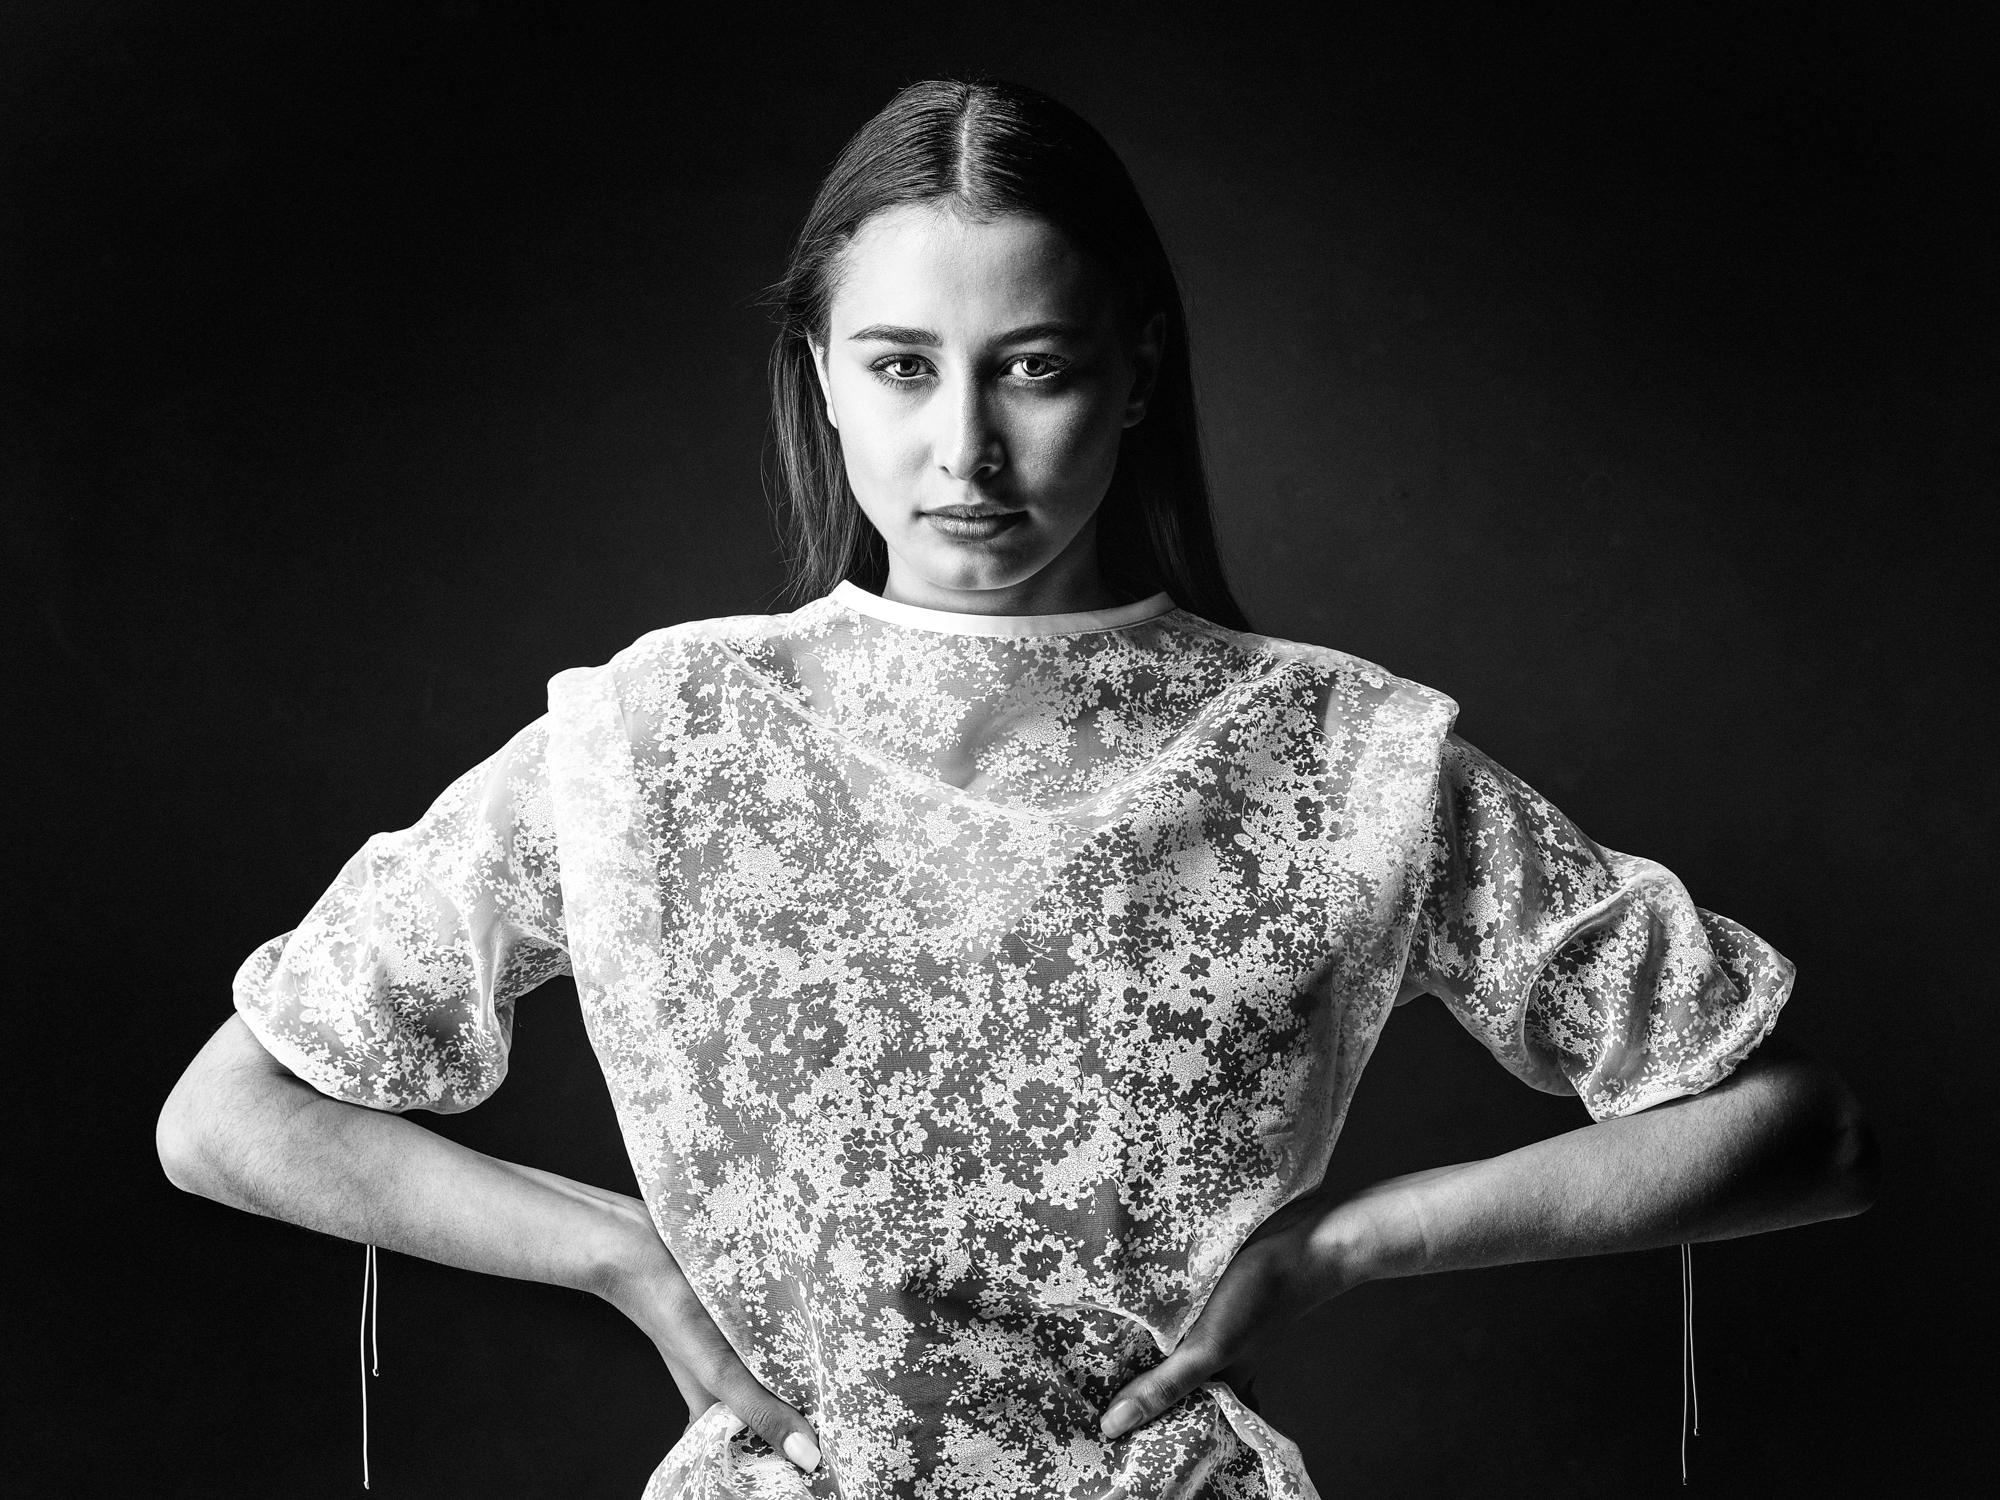 Studio Portrait Fotografie, Kim, time models, Peoplefotografie, Portraitfotografie_Studioportrait-Zürich